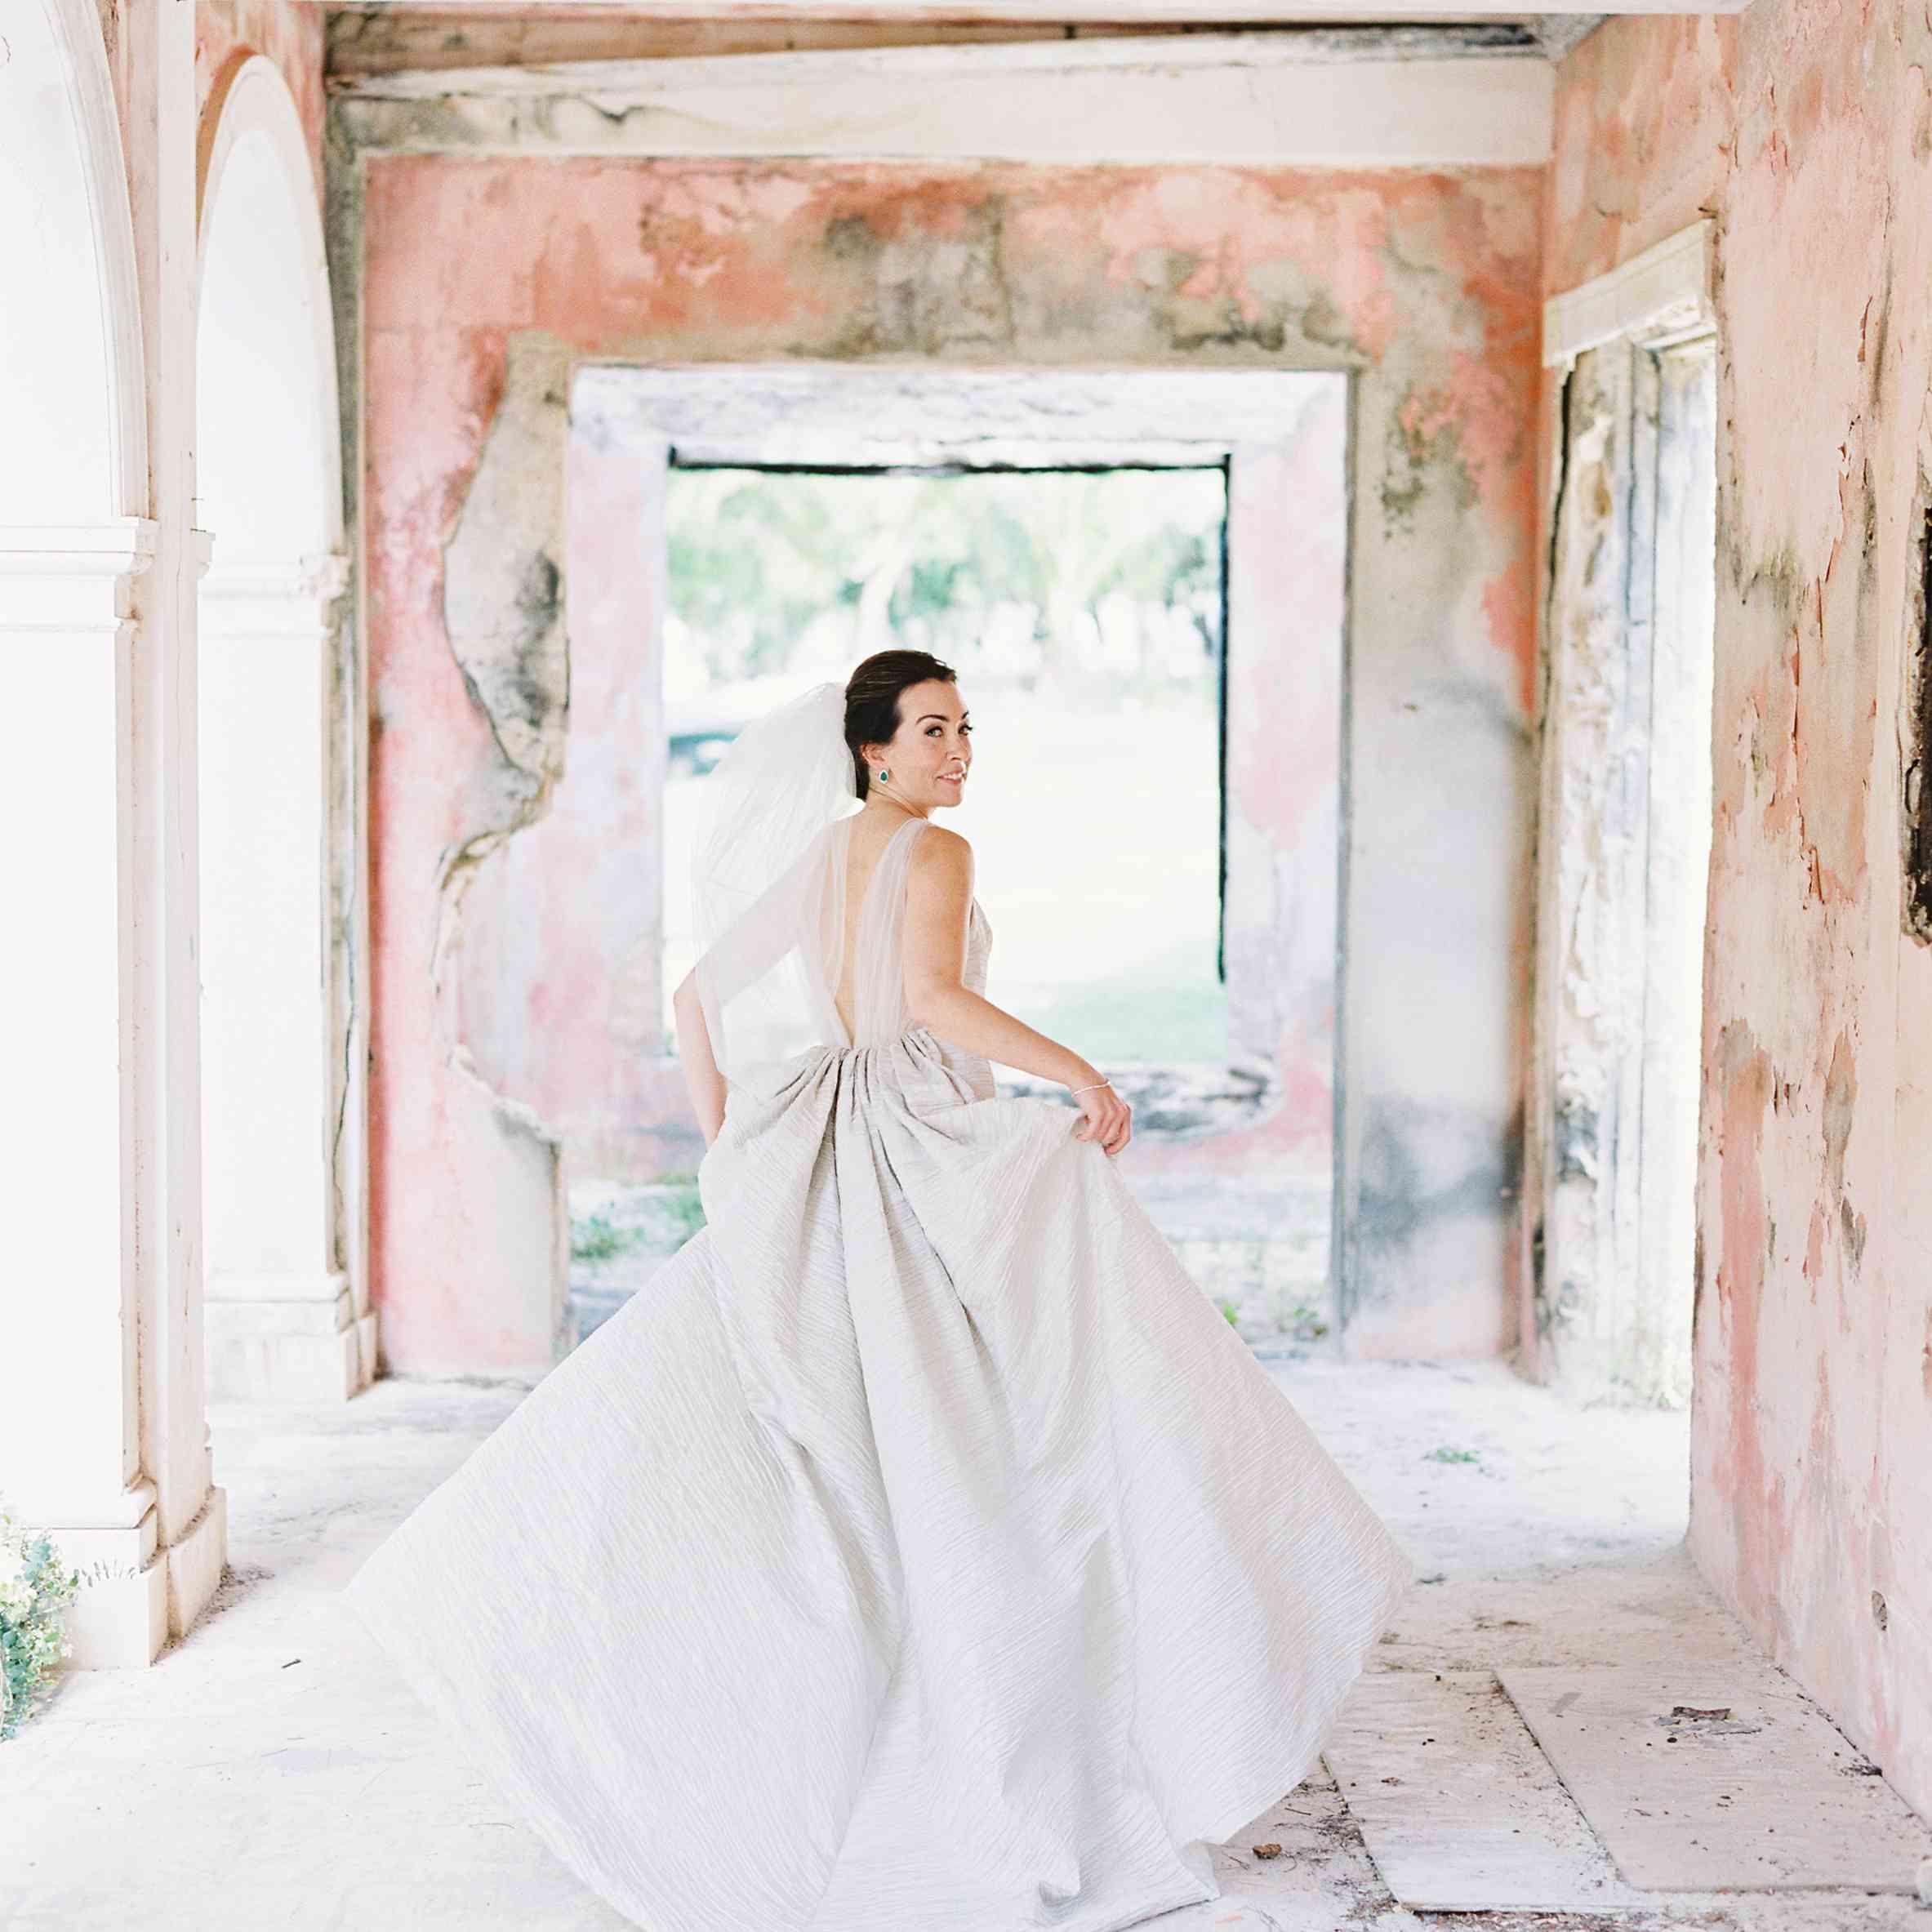 <p>back of wedding dress</p><br><br>